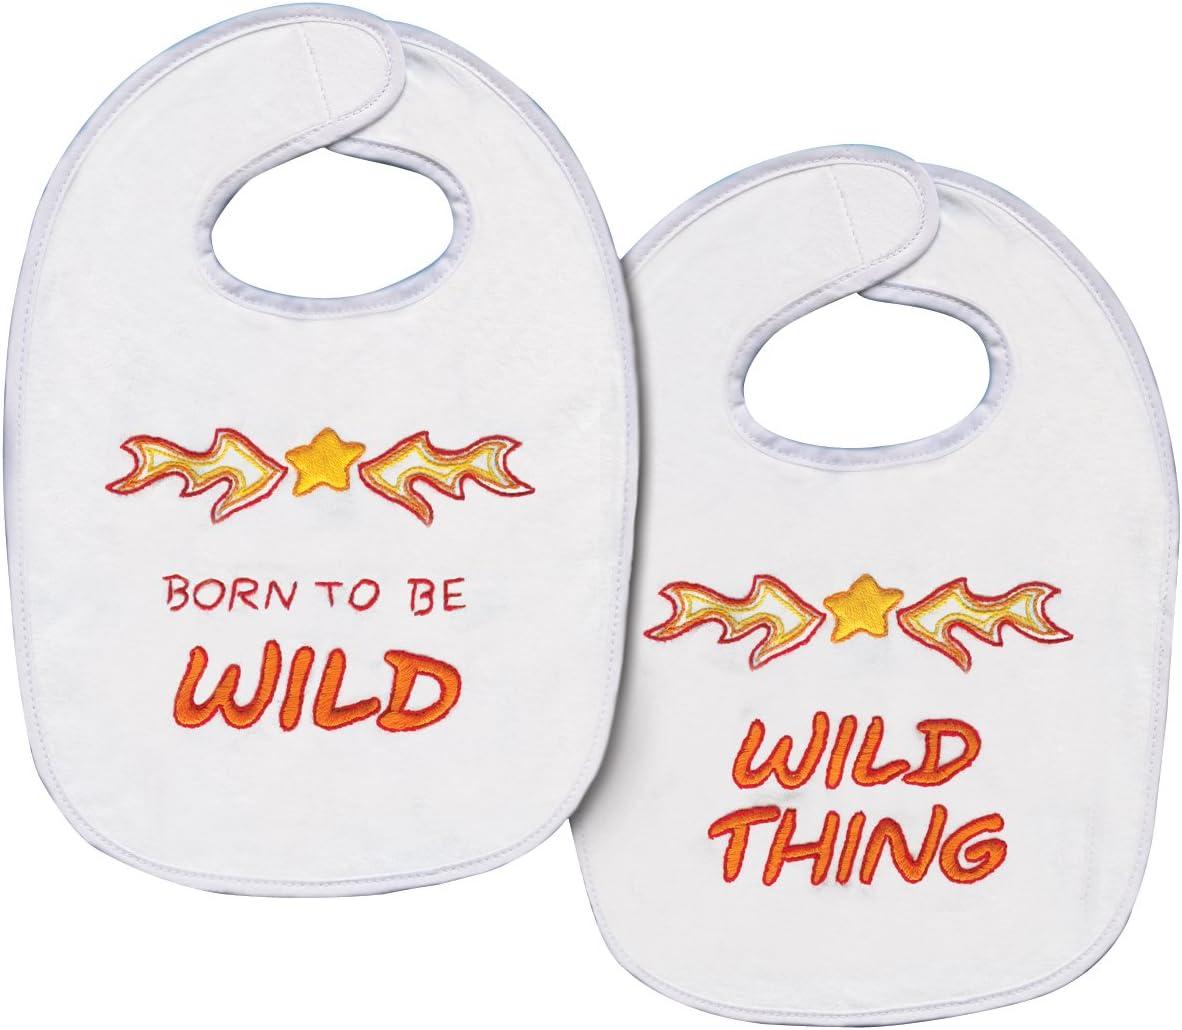 Tobin Born to be Wild Bib Pair Stamped Cross Stitch Kit 7-1//2 by 11-Inch Set of 2